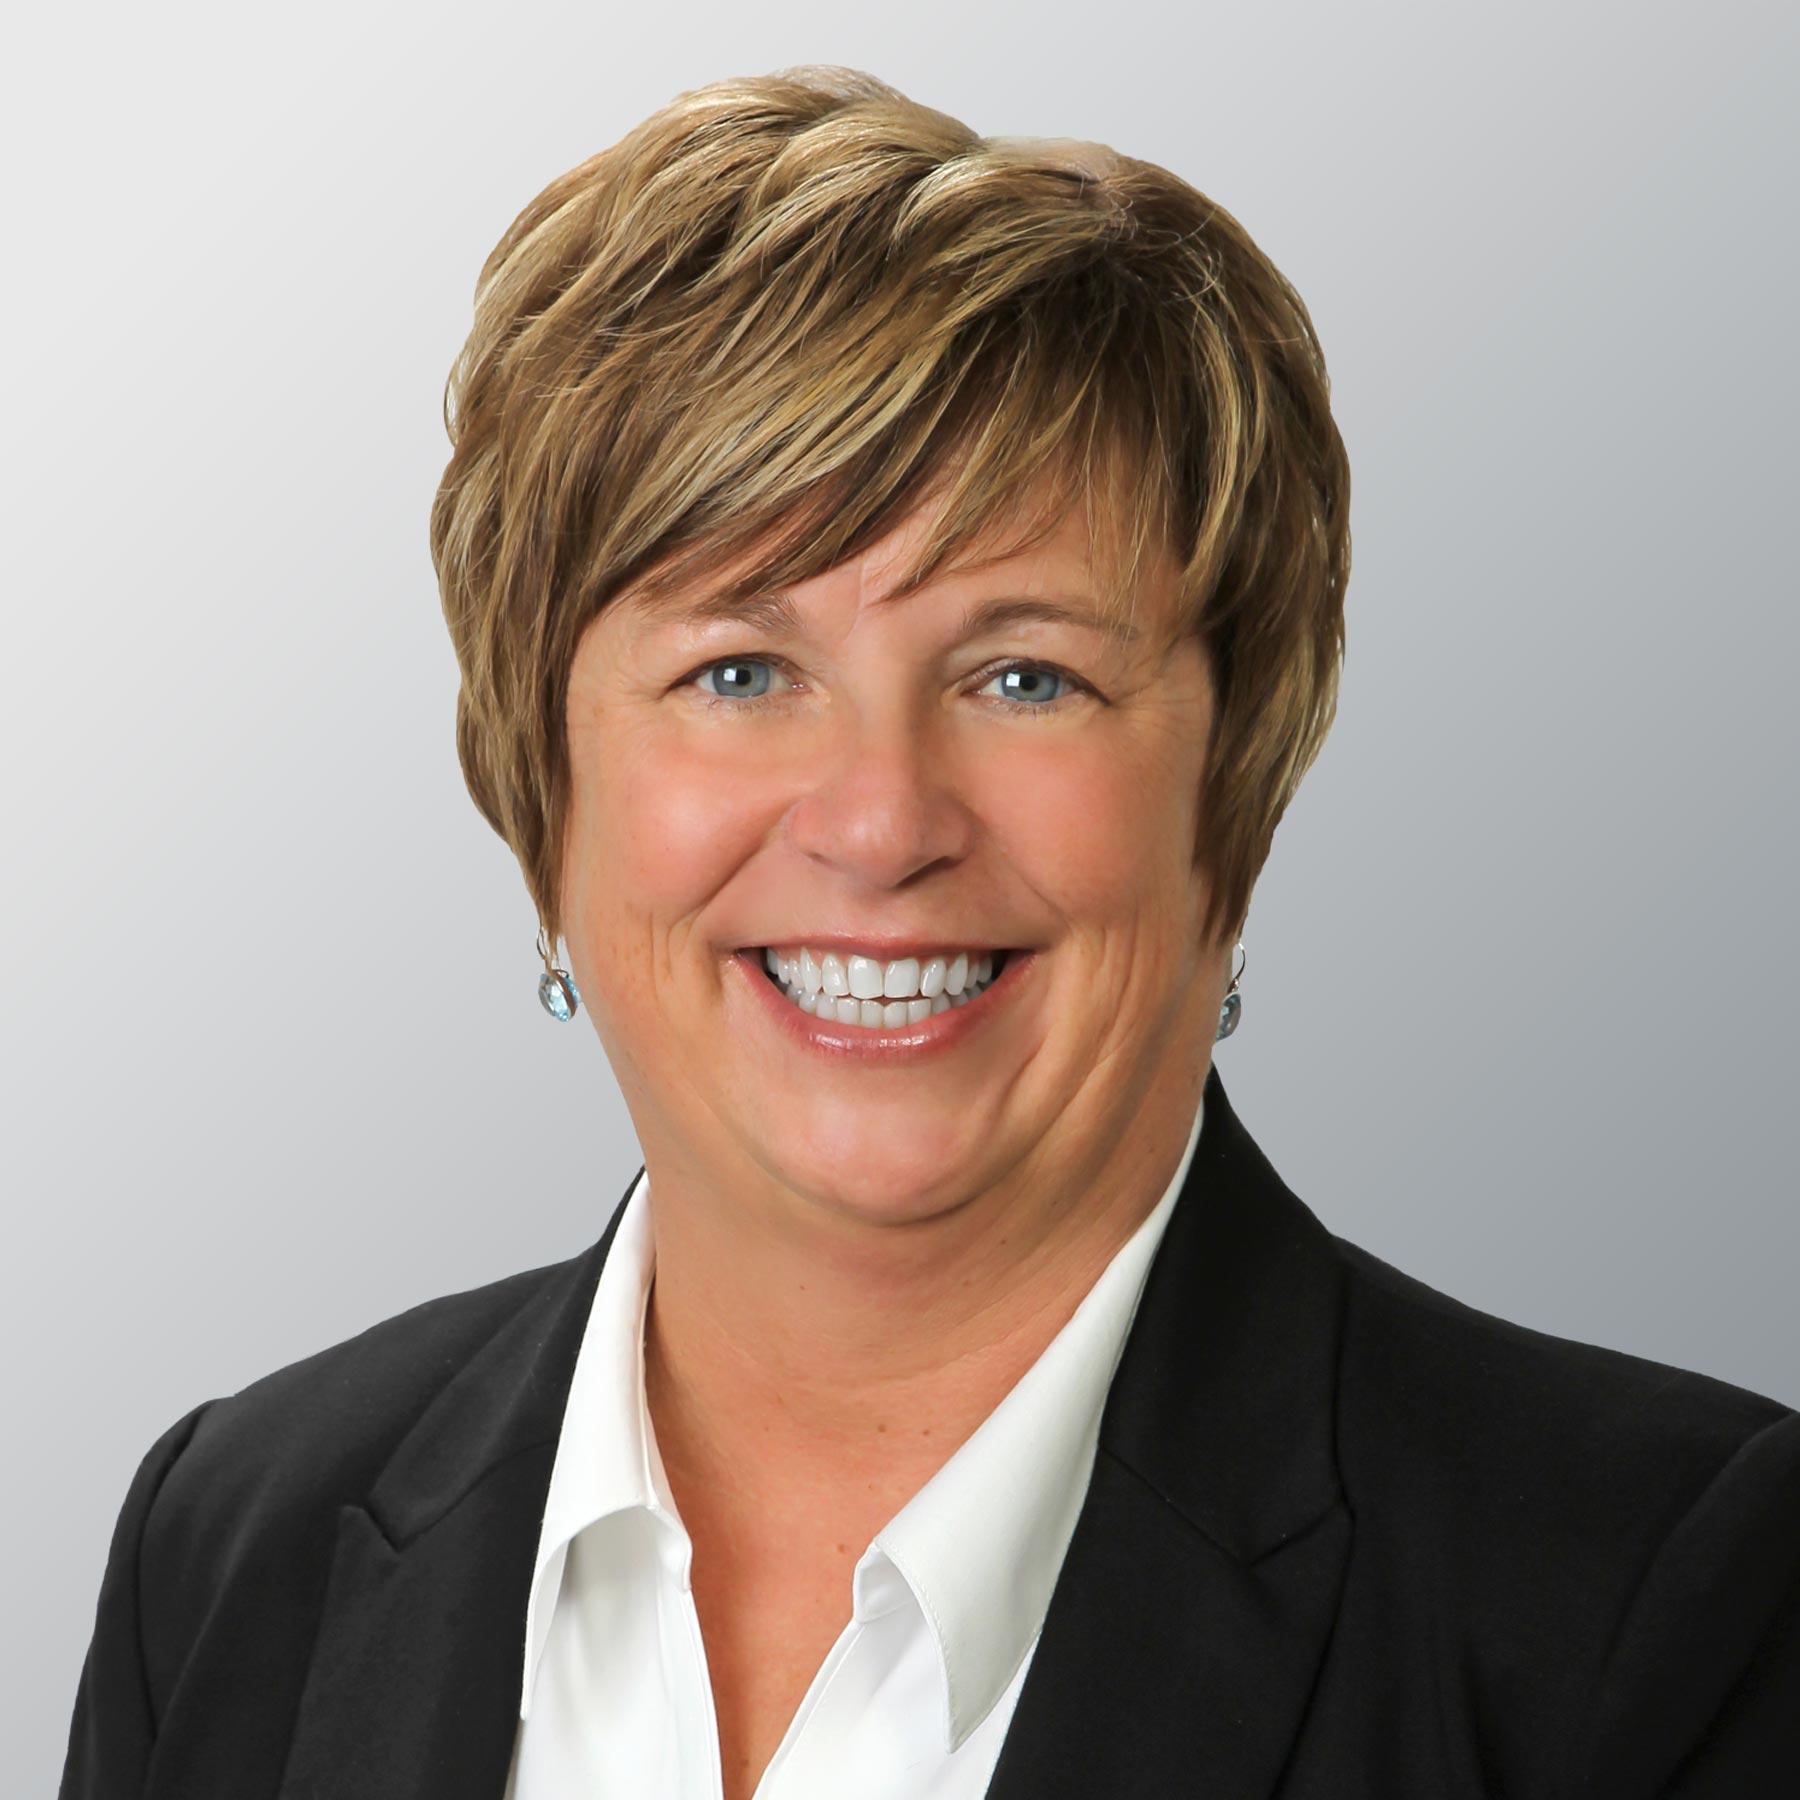 Listing Agent Louise Maddigan